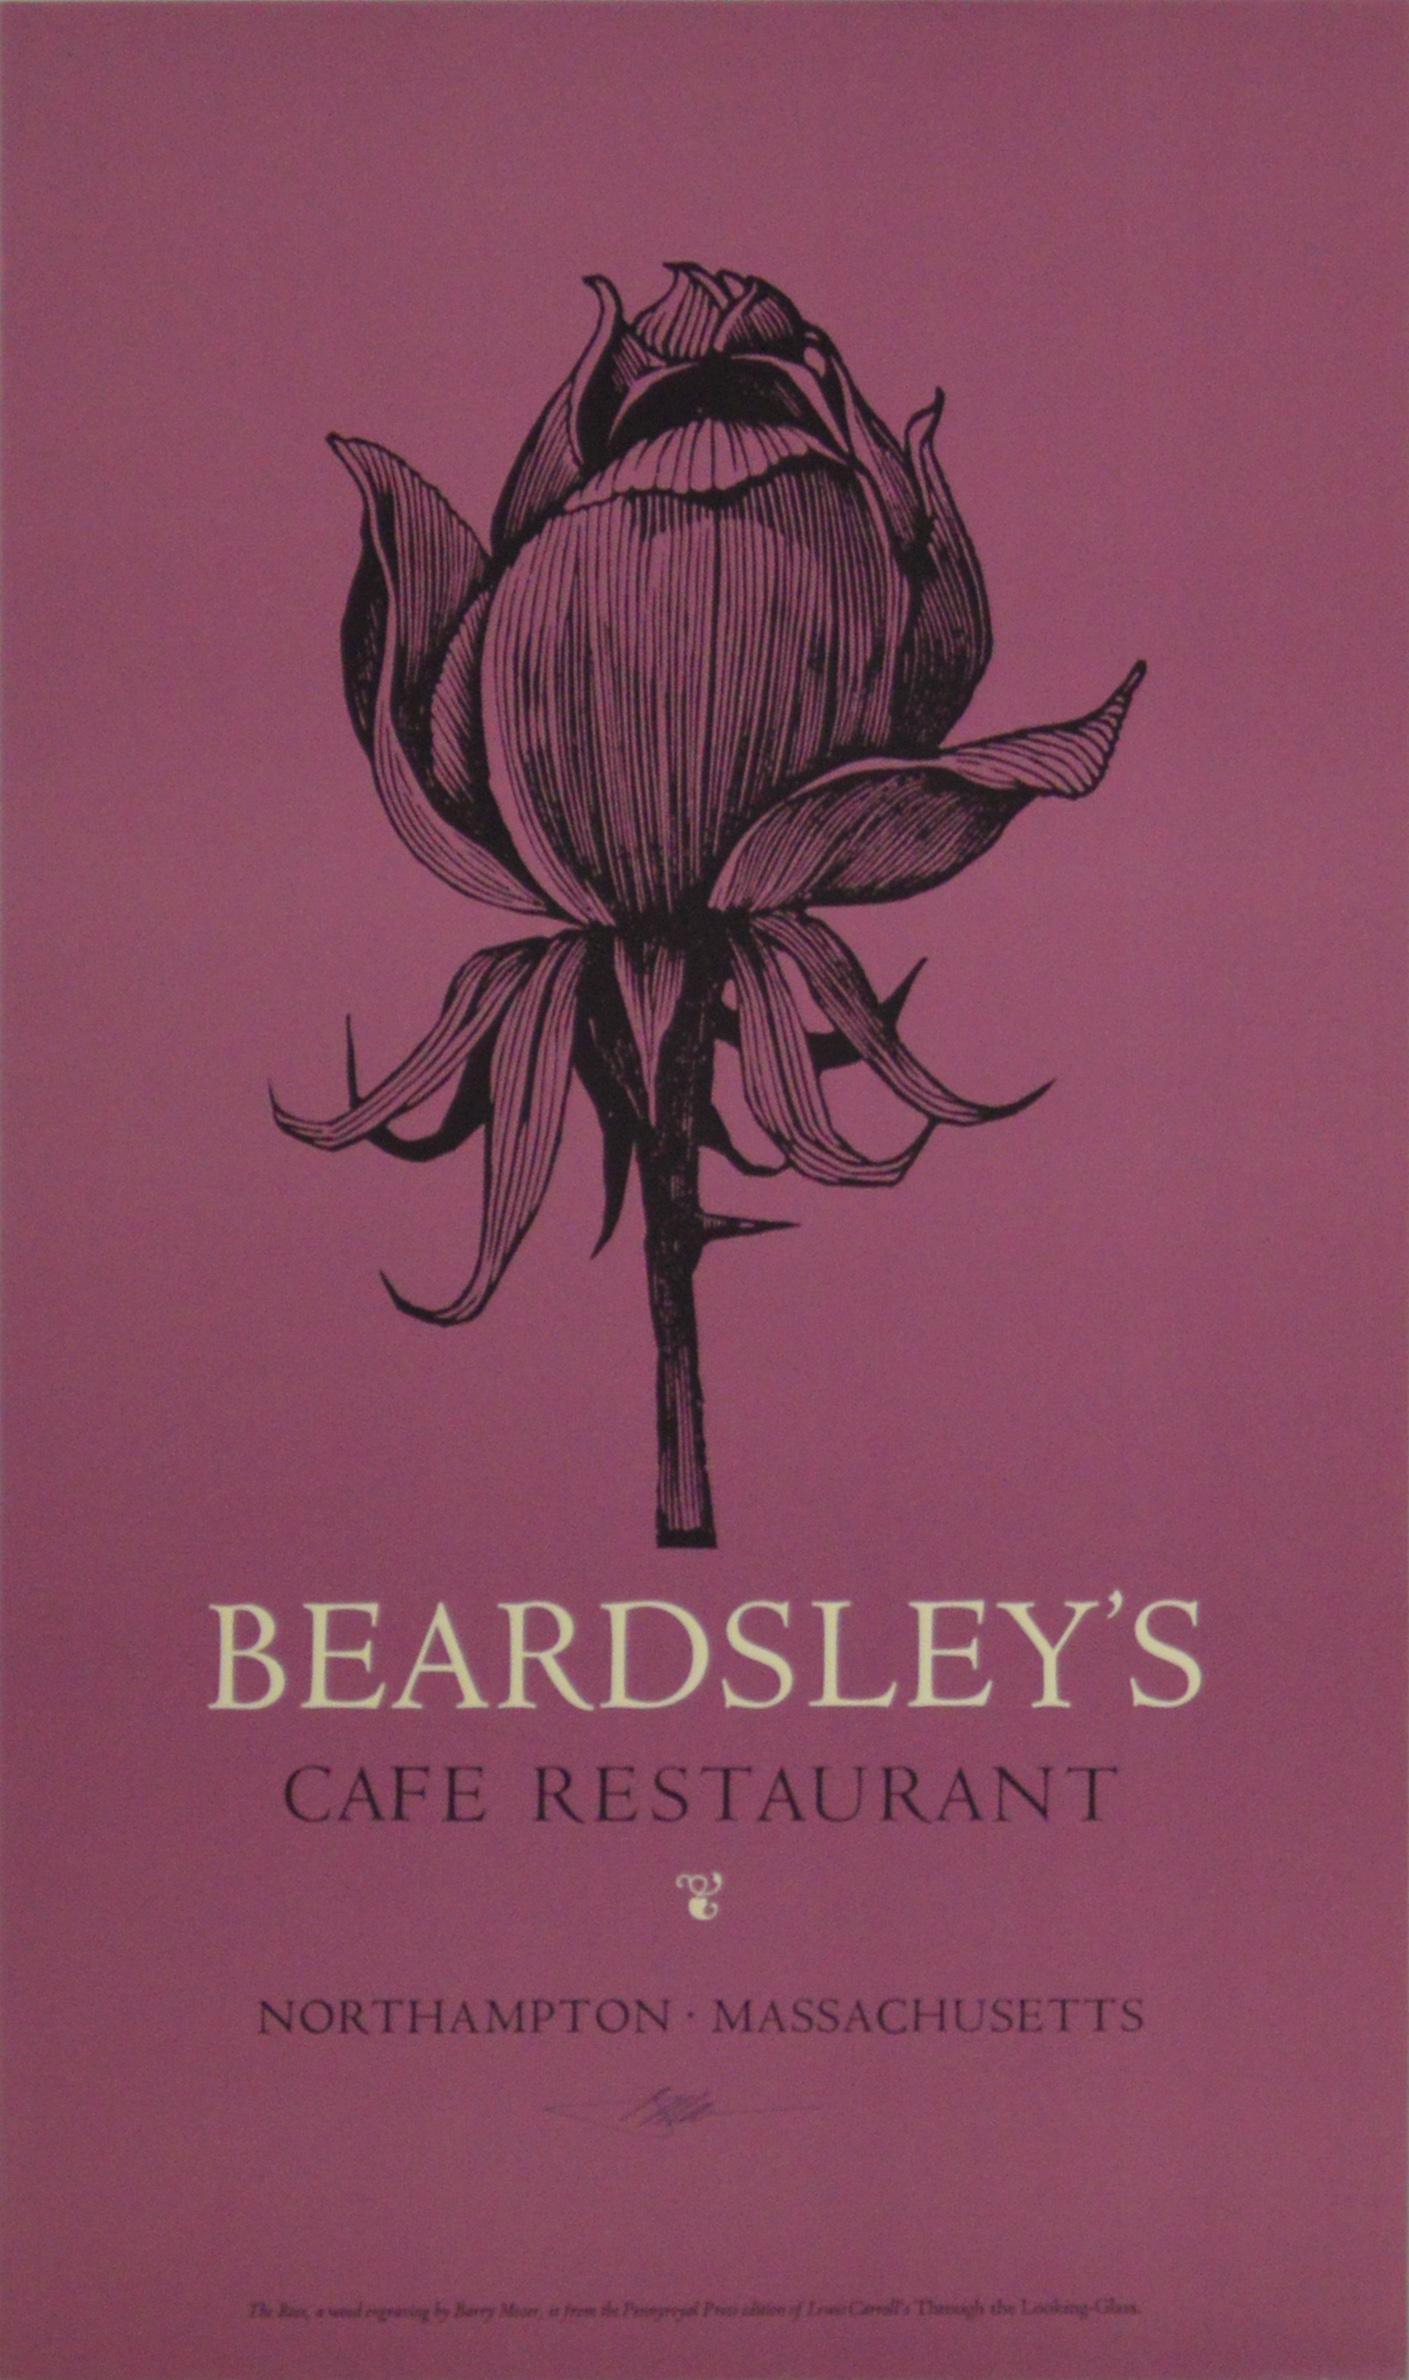 Beardsley's Rose